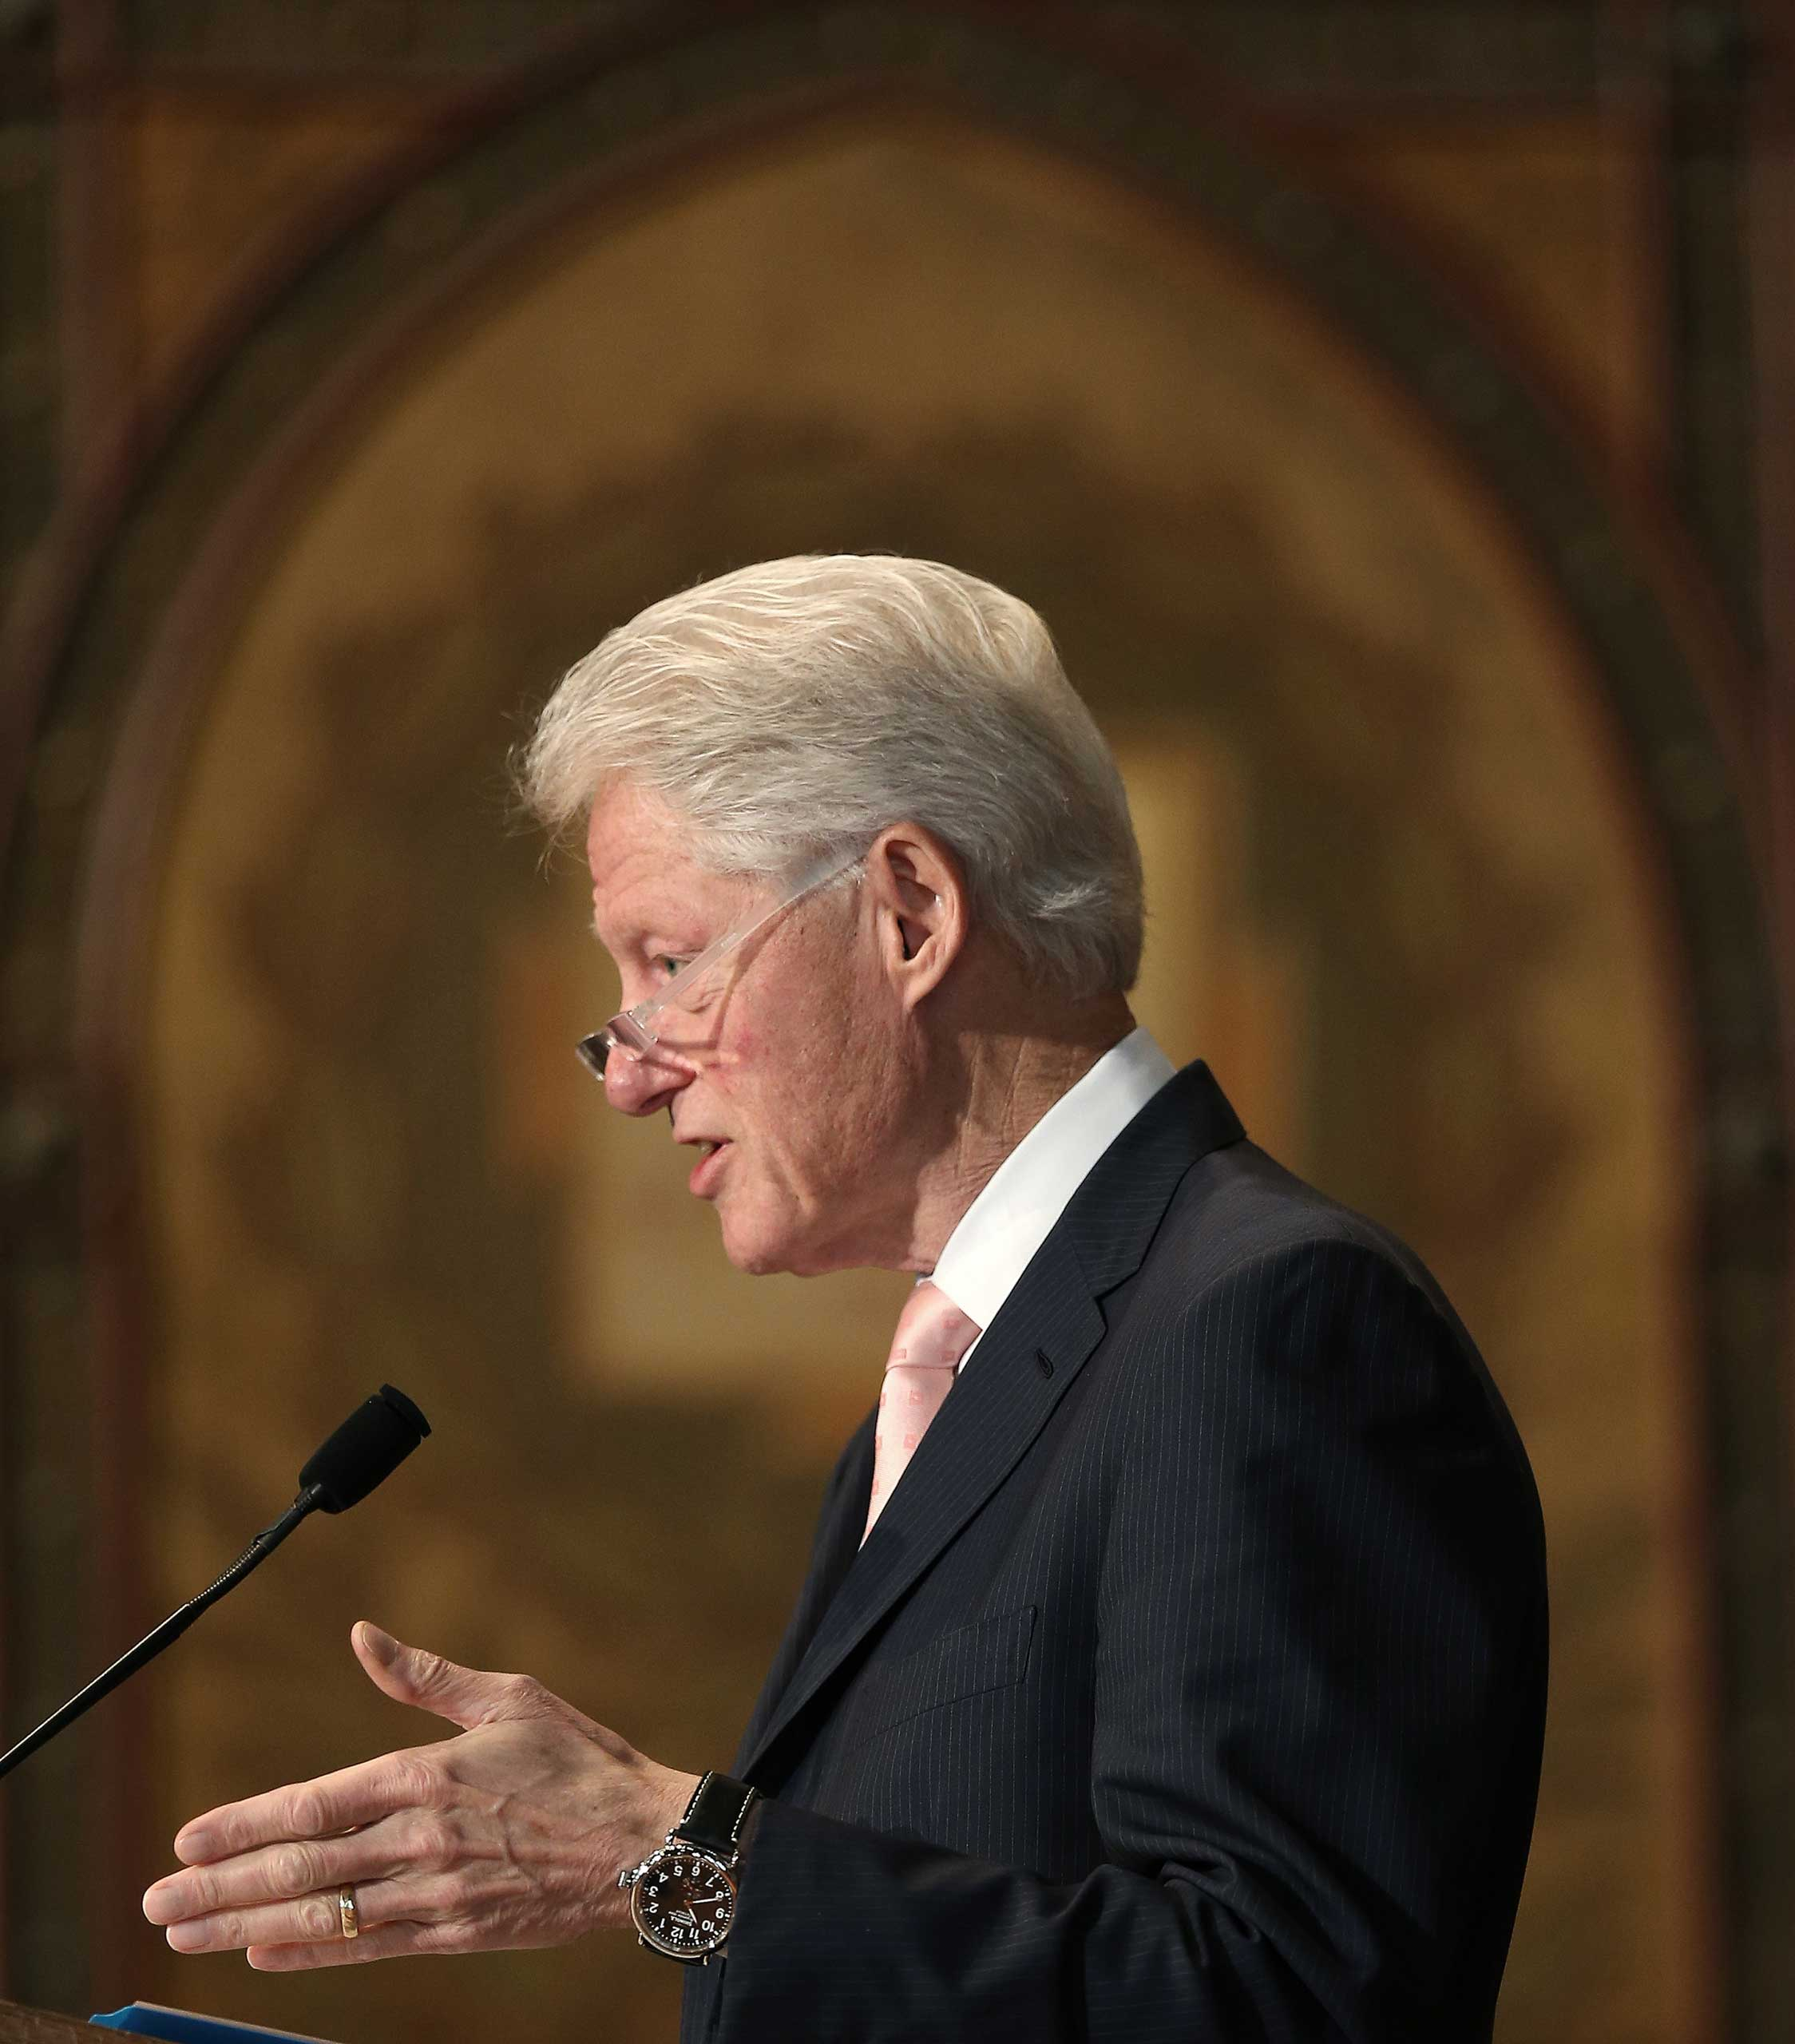 Former U.S. President Bill Clinton speaks at Georgetown University in Washington on April 21, 2015.